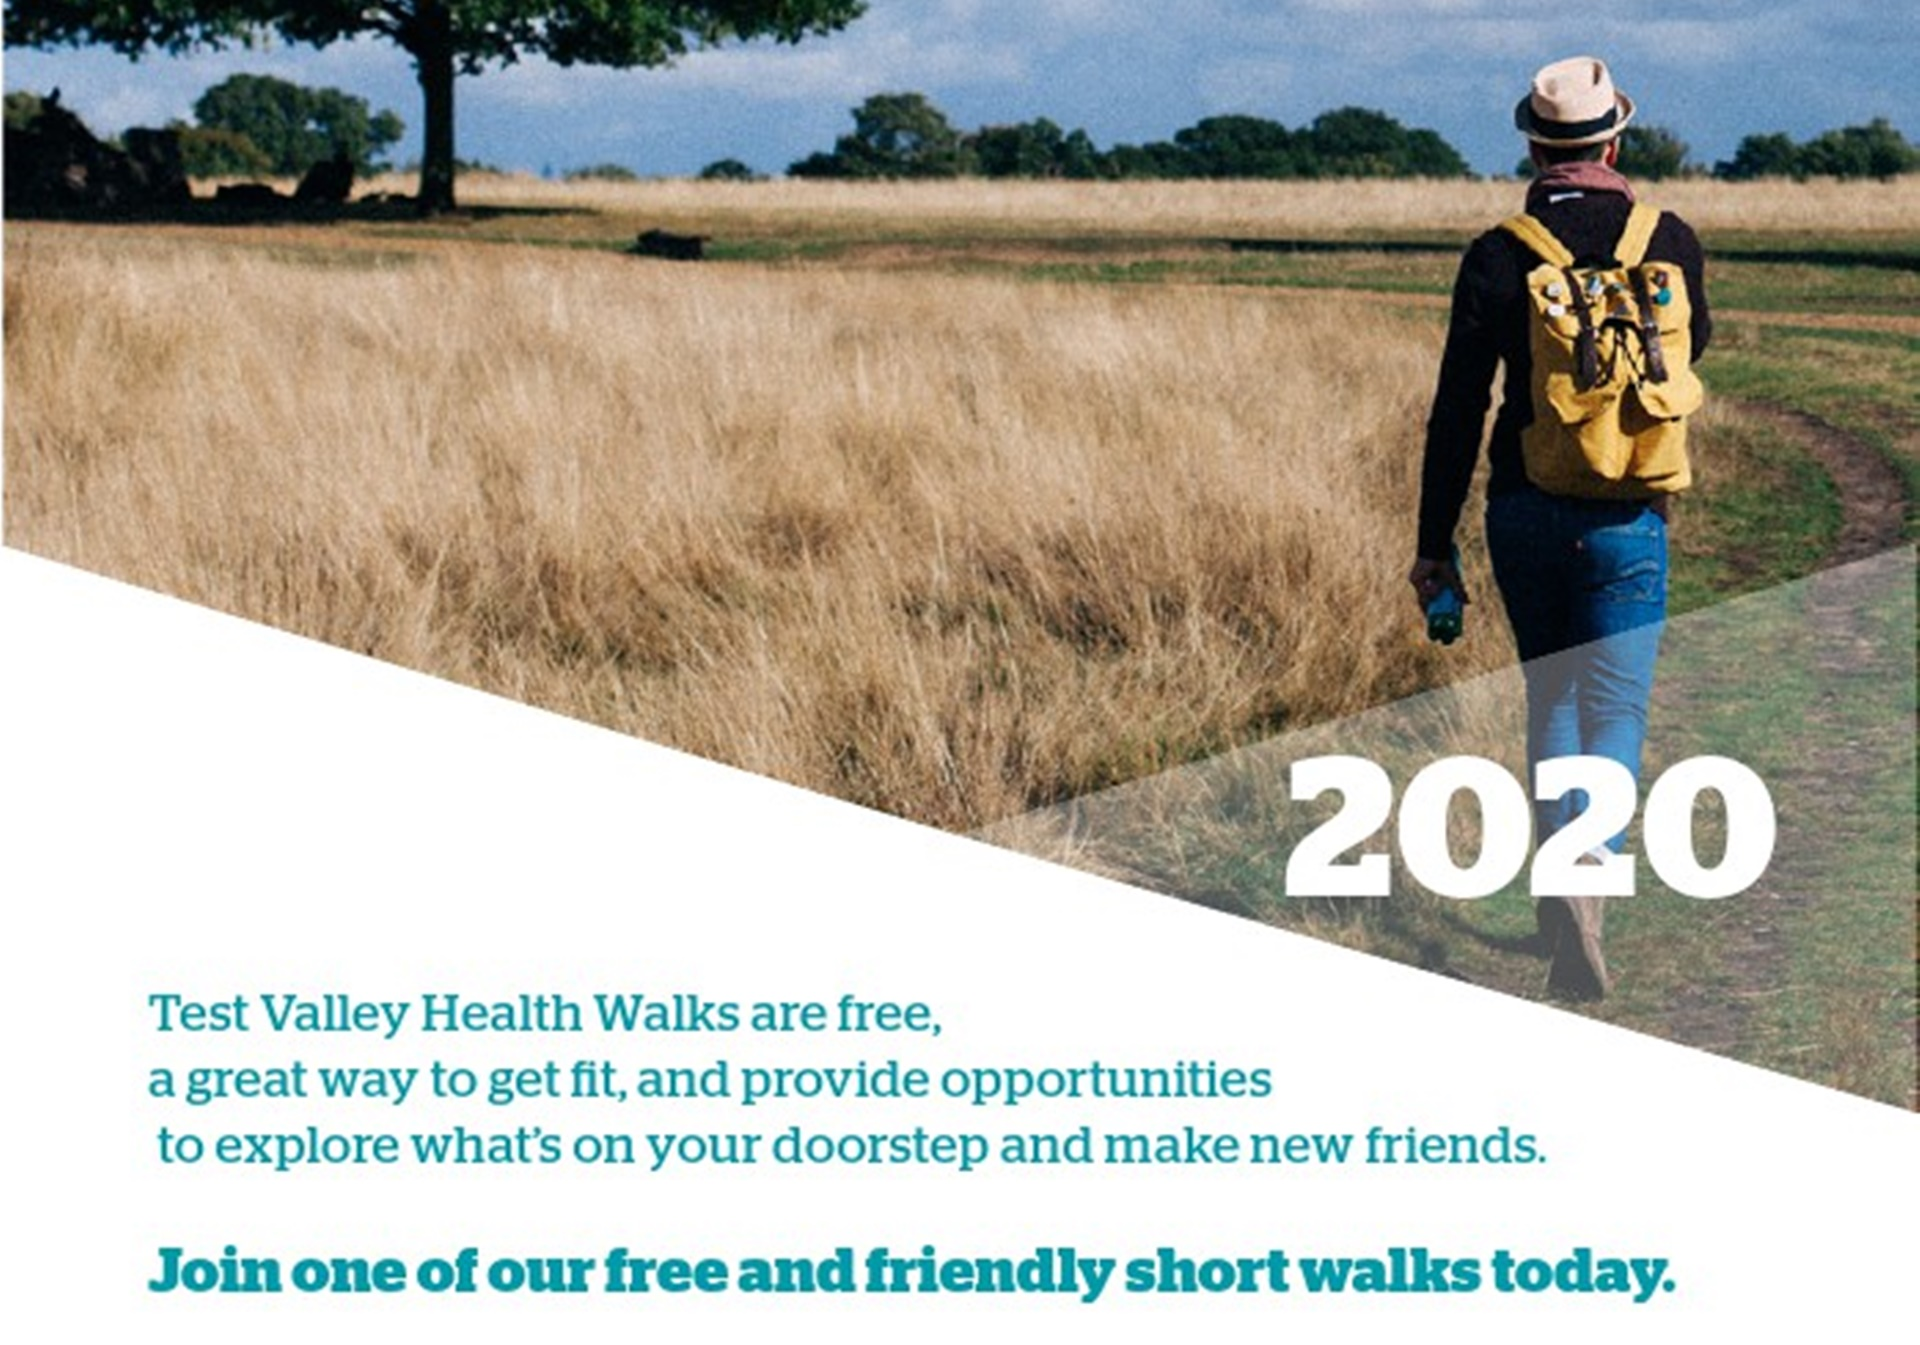 Andover Romsey Health Walks 2020